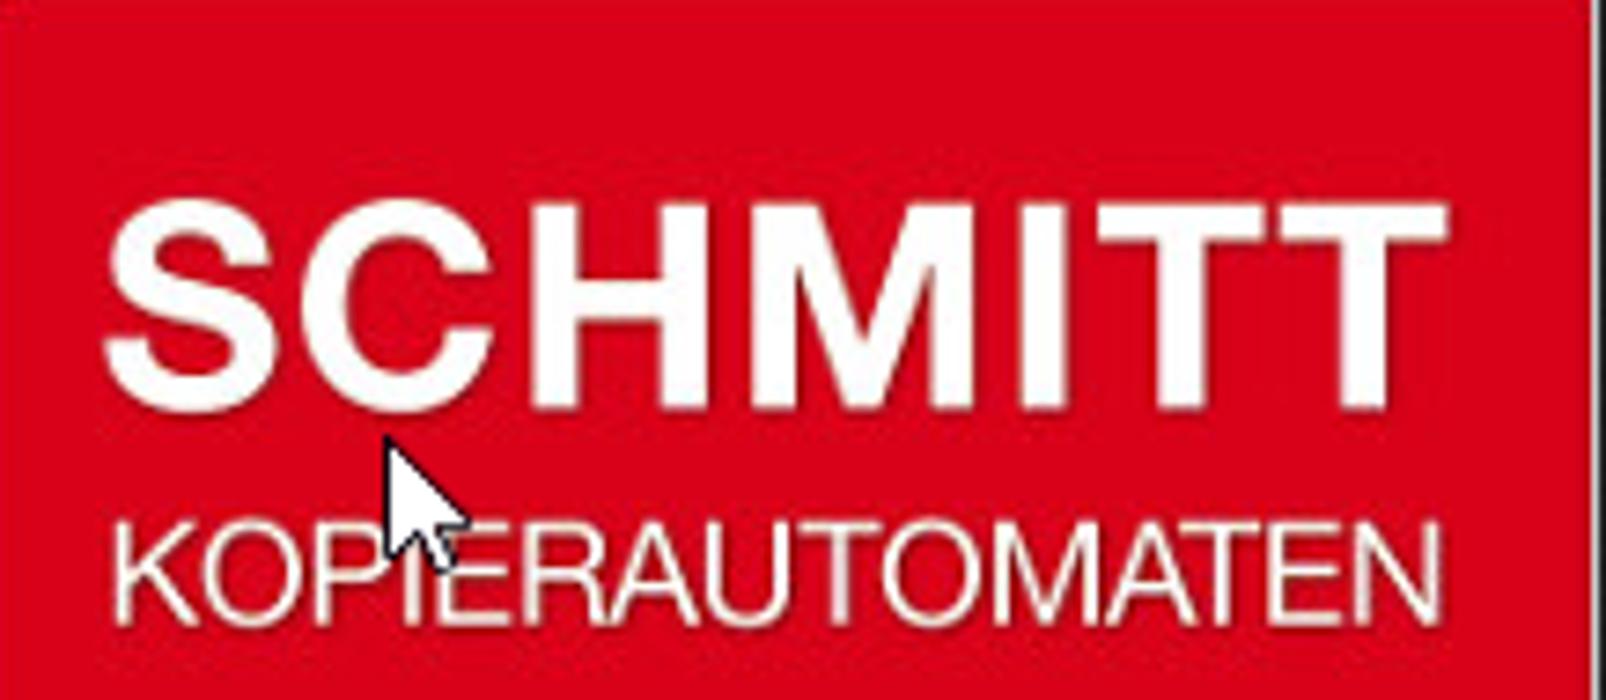 Bild zu Schmitt Kopierautomaten GmbH in Mainz